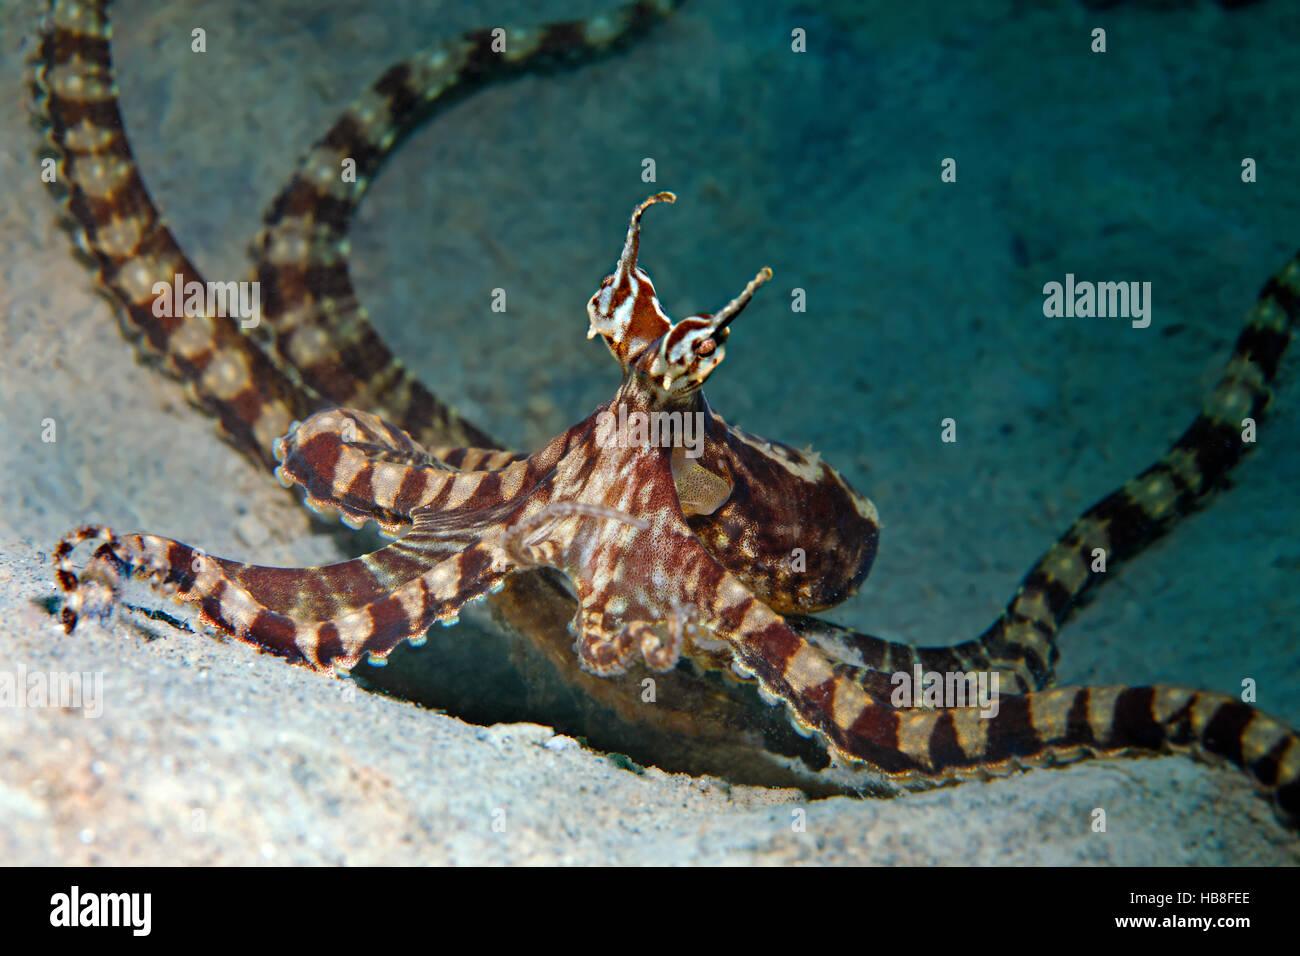 Wonderpus octopus (Wonderpus photogenicus), Bunaken National Park, Sulawesi, Celebes Sea, Indian Ocean, Indonesia - Stock Image